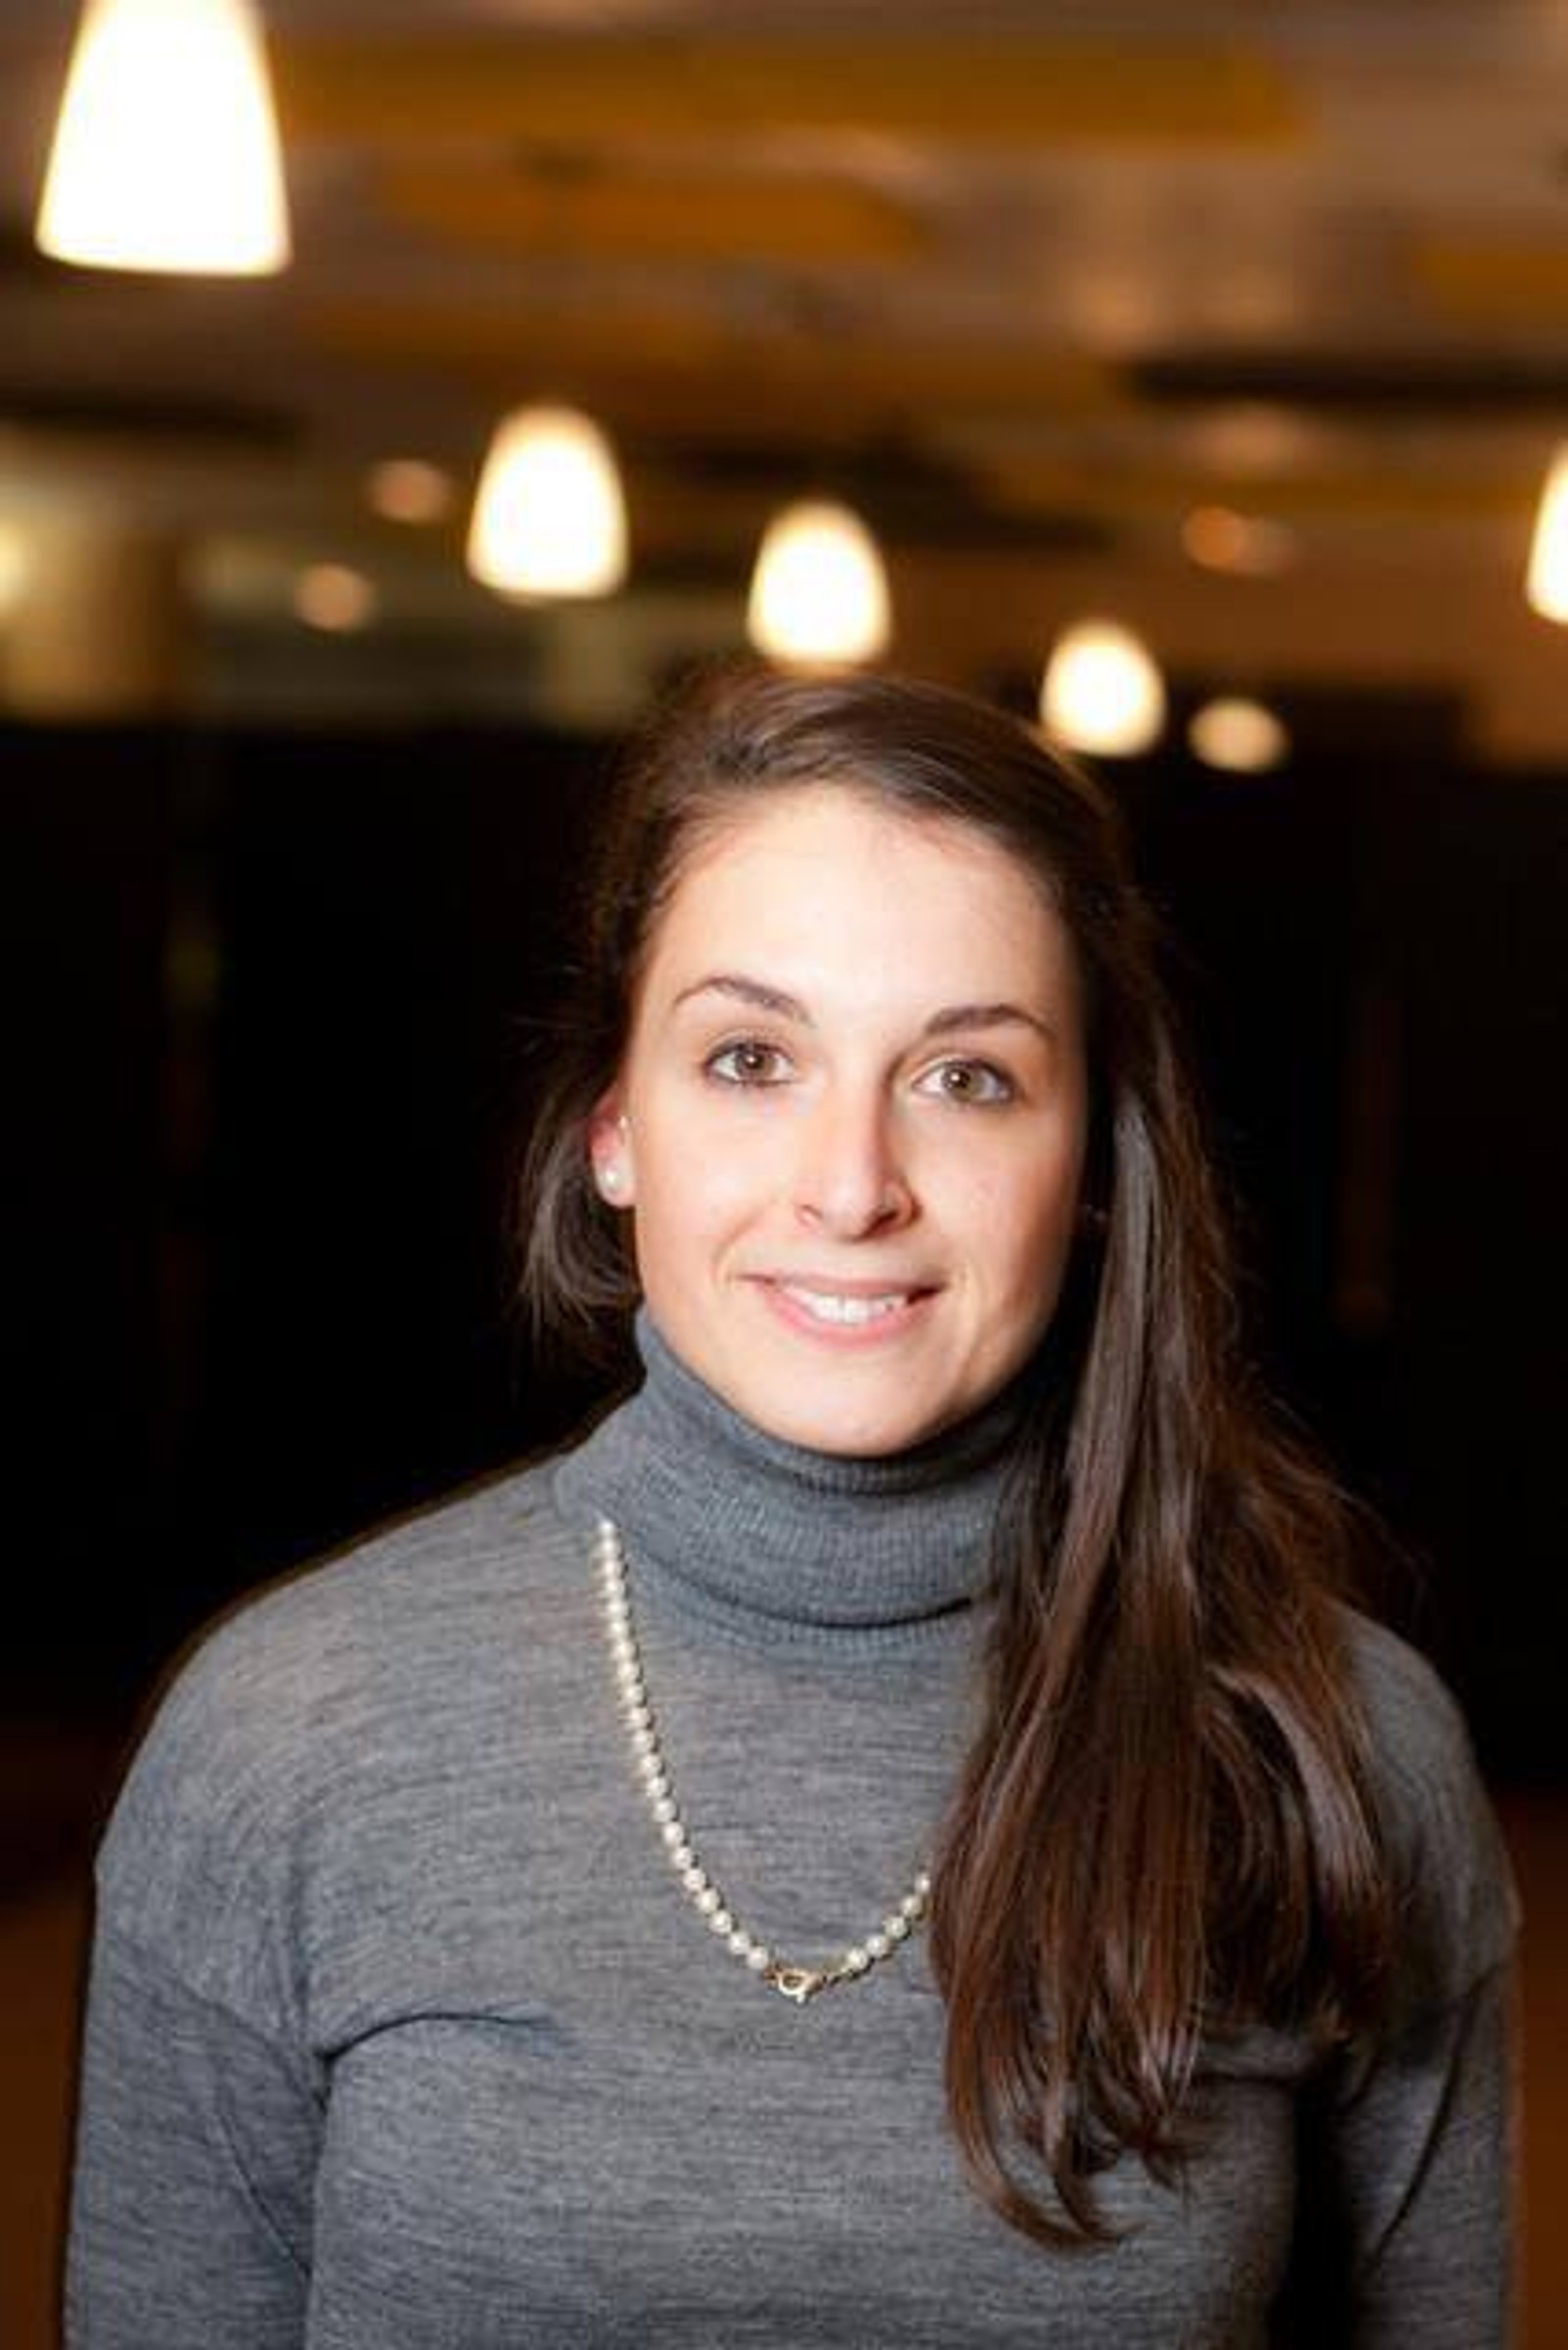 DREPT: Italienske Valeria Solesin (28) kom fra Venezia, men bodde i Paris. Hun var doktorgradsstudent i demografi-. Valeria var på Bataclan med kjæresten sin da hun ble drept.